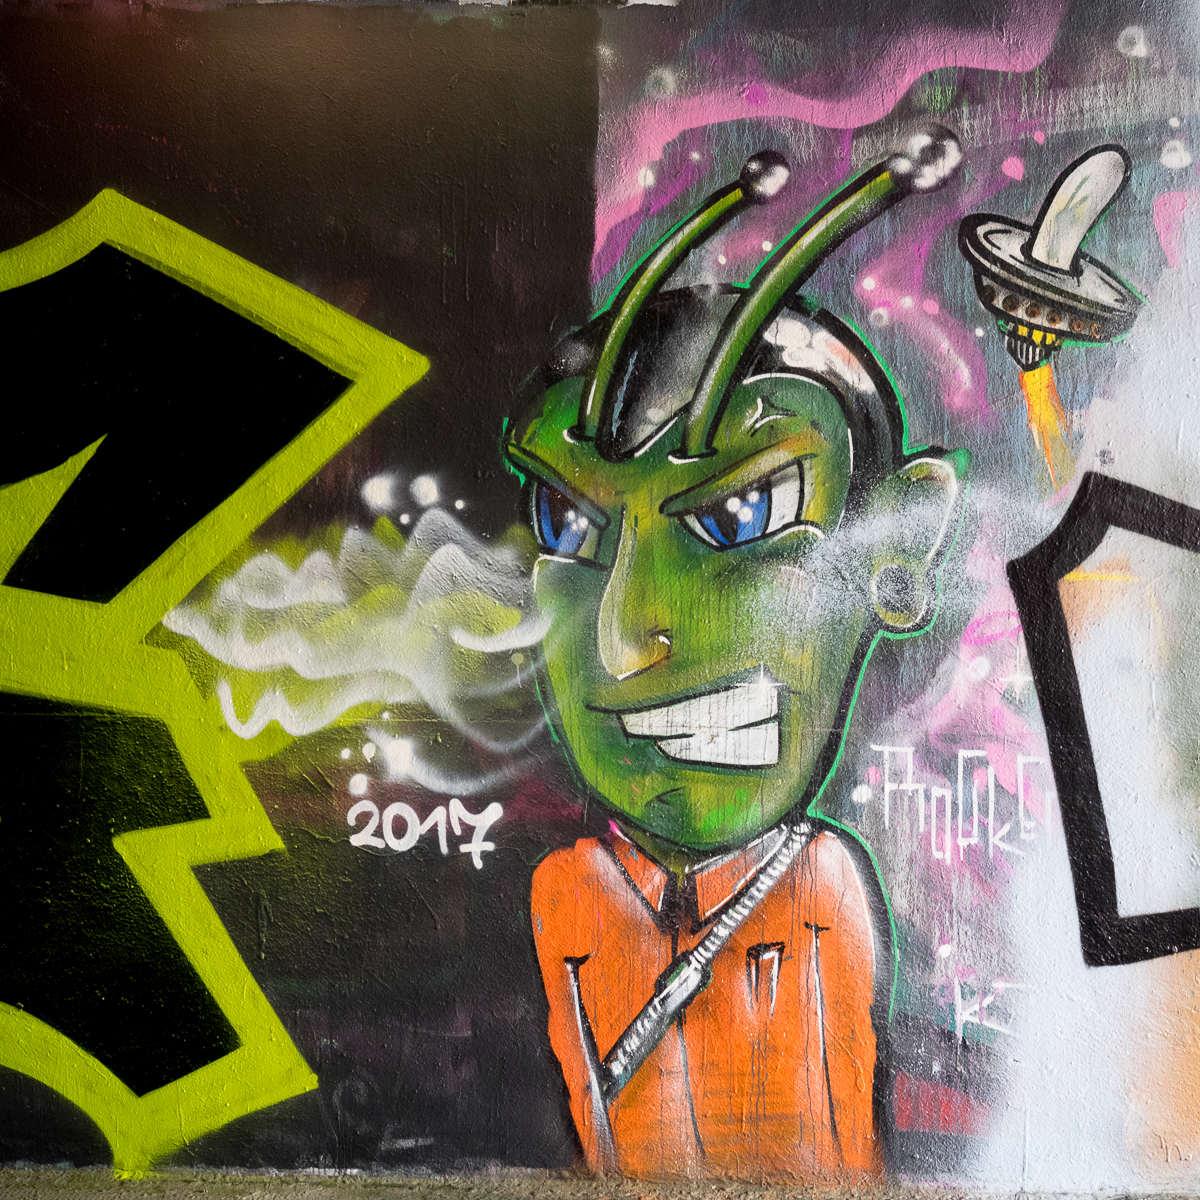 Frankfurt – Graffiti am Ratswegkreisel (79) – 03/2017